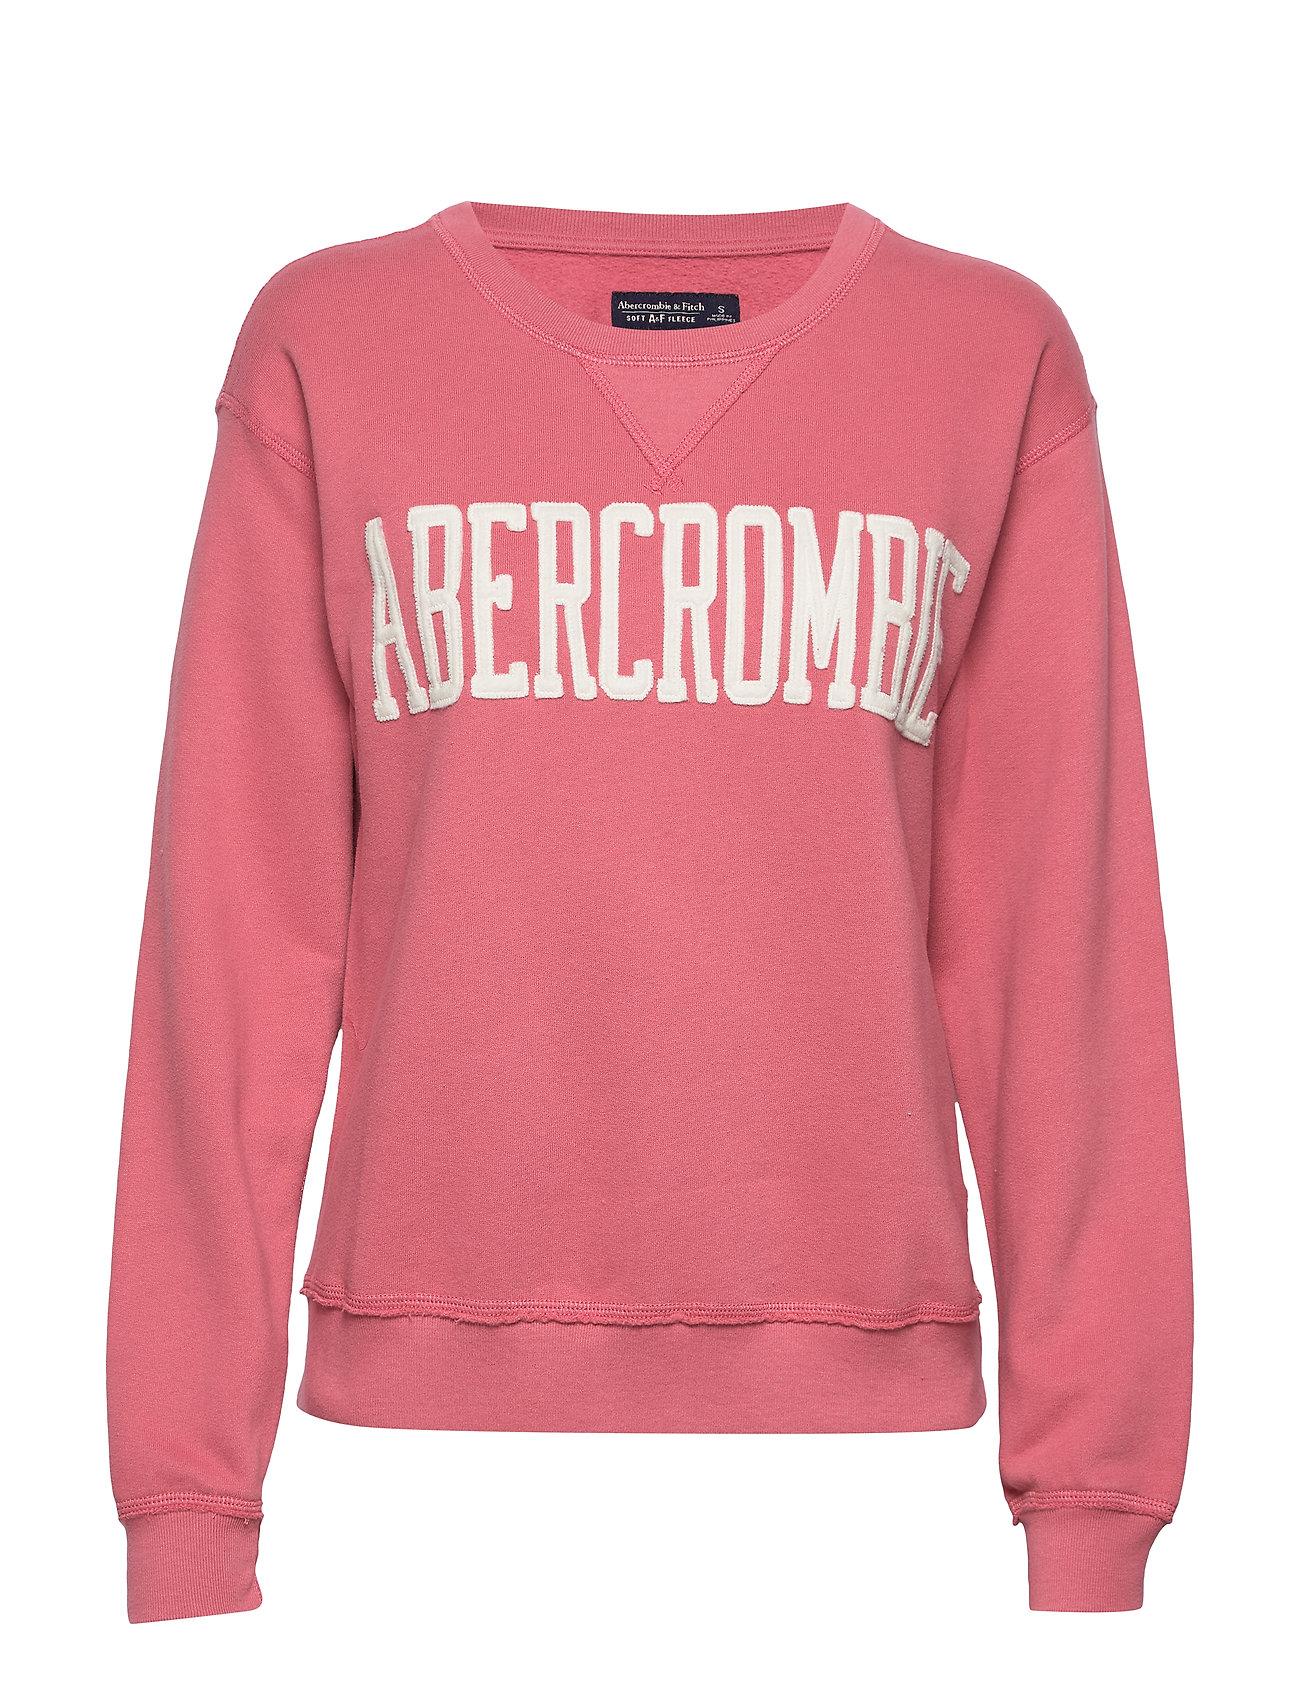 Abercrombie & Fitch Logo Crewneck Sweatshirt - RED DD